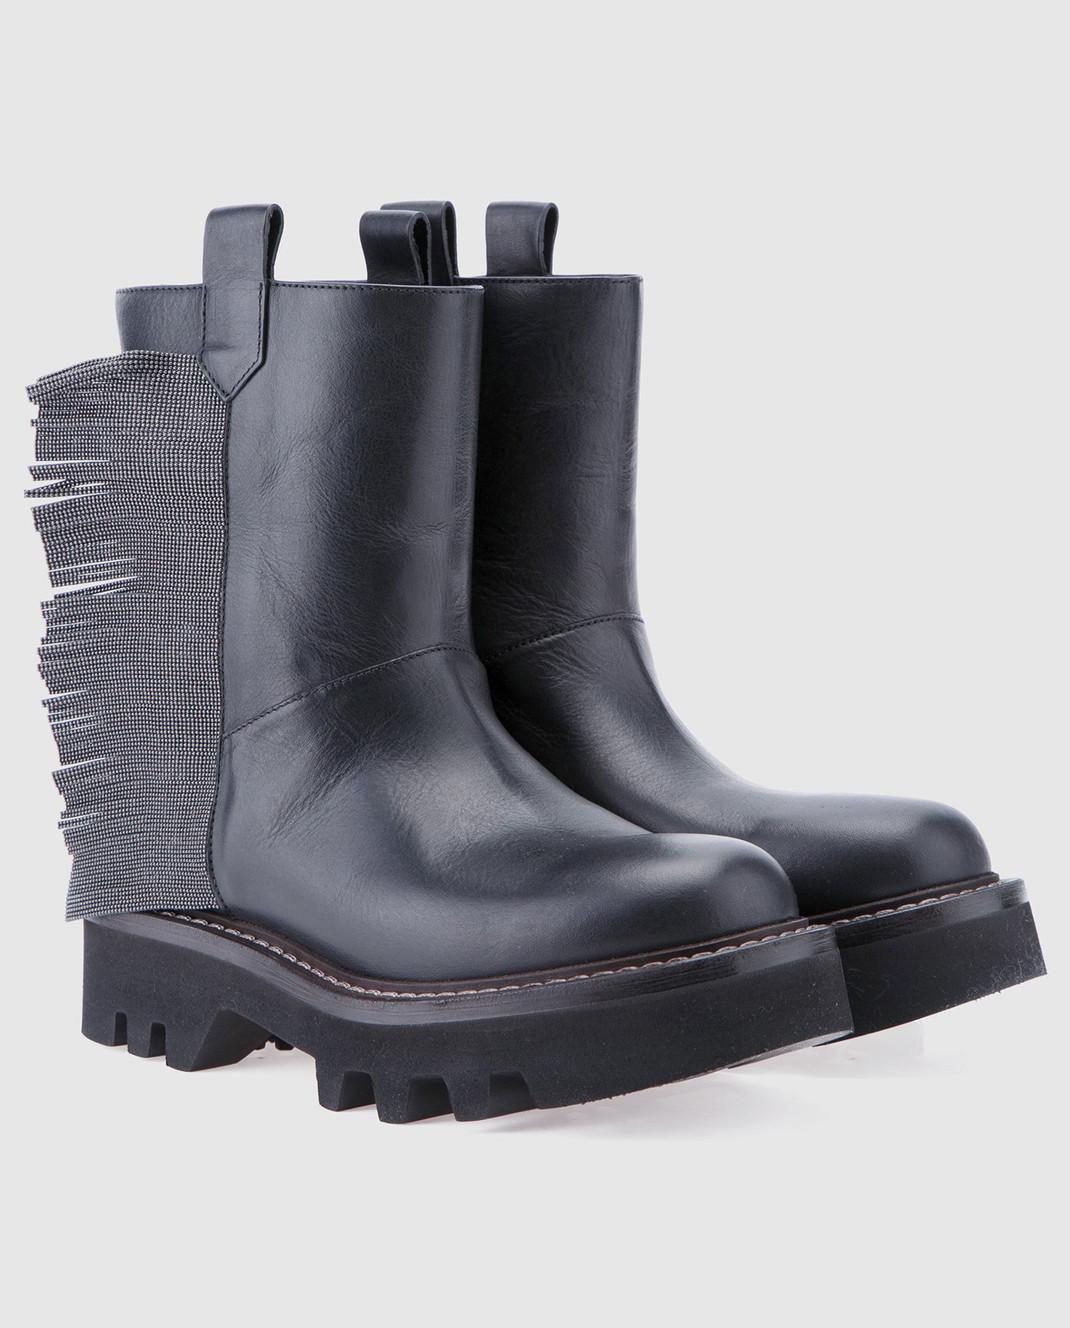 Brunello Cucinelli Черные кожаные сапоги MZFLG1009 изображение 2